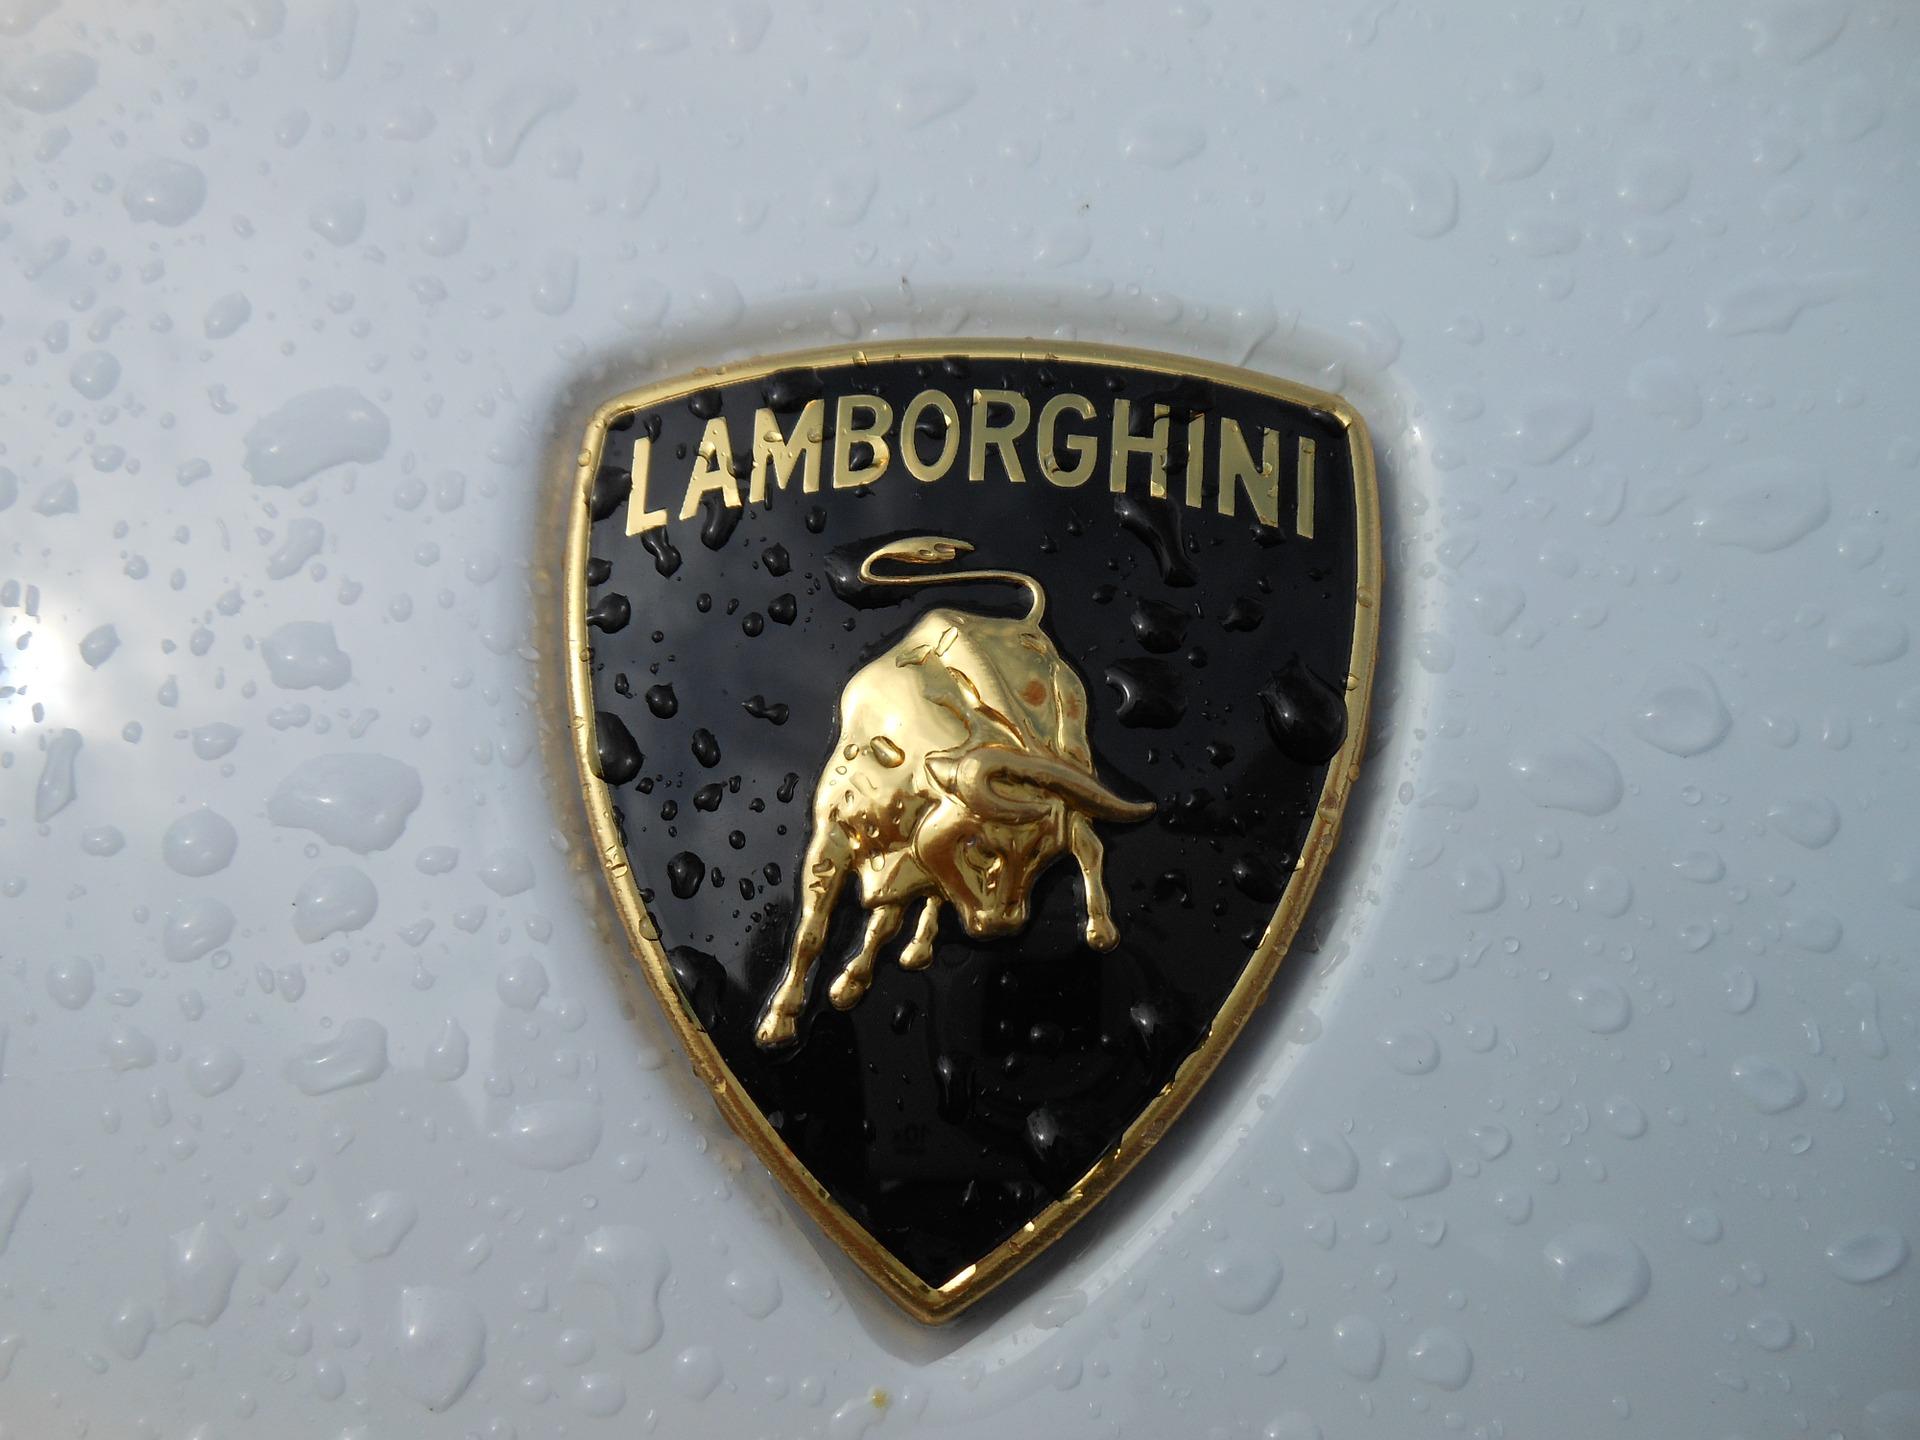 lamborghini-1104868_1920